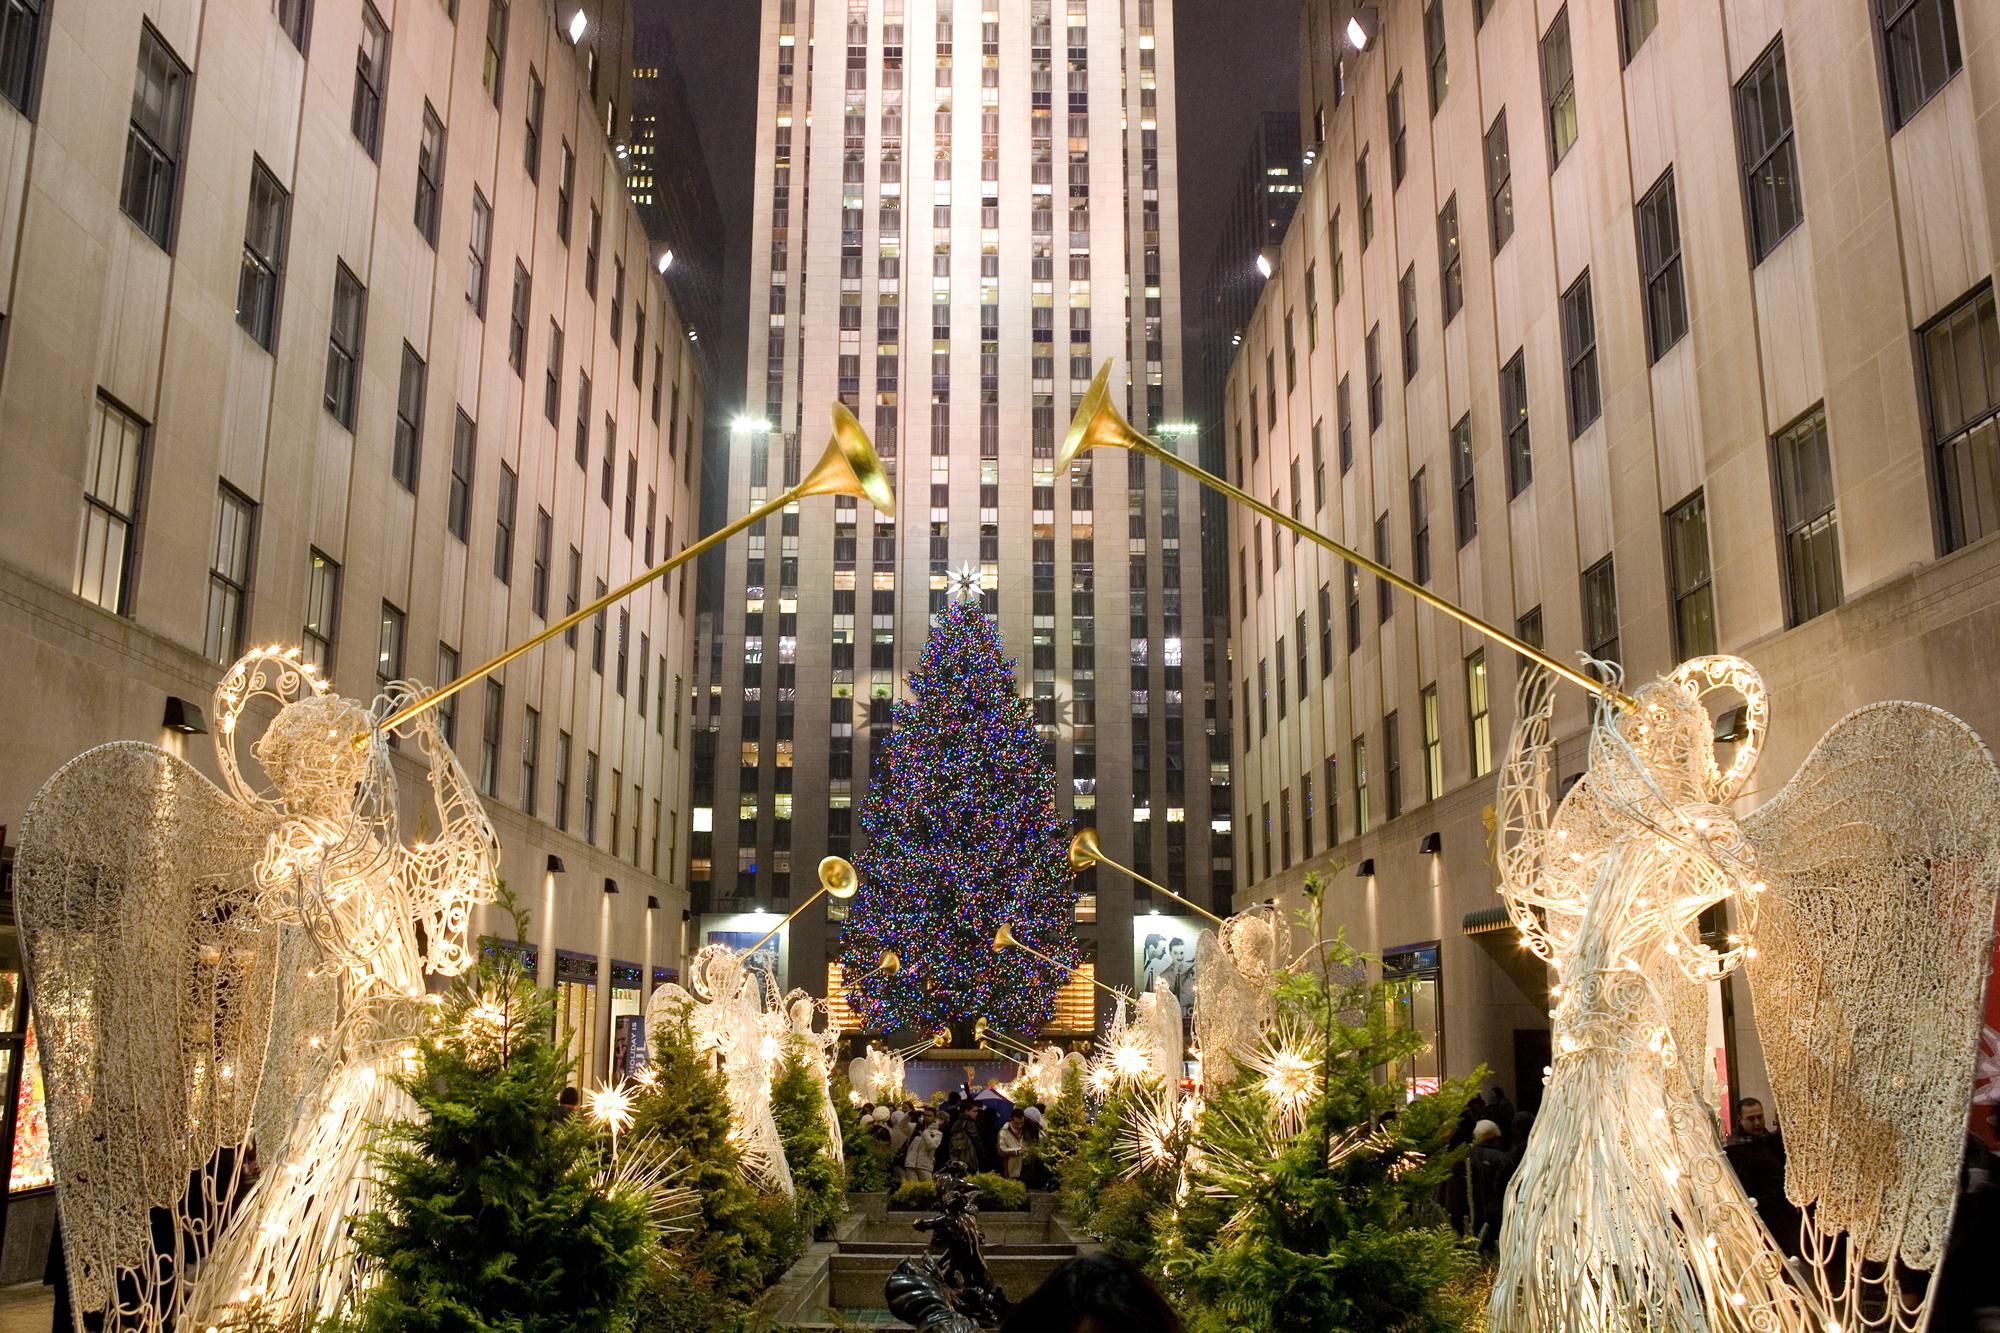 Christmas in the Romona Keveza New York City Flagship!